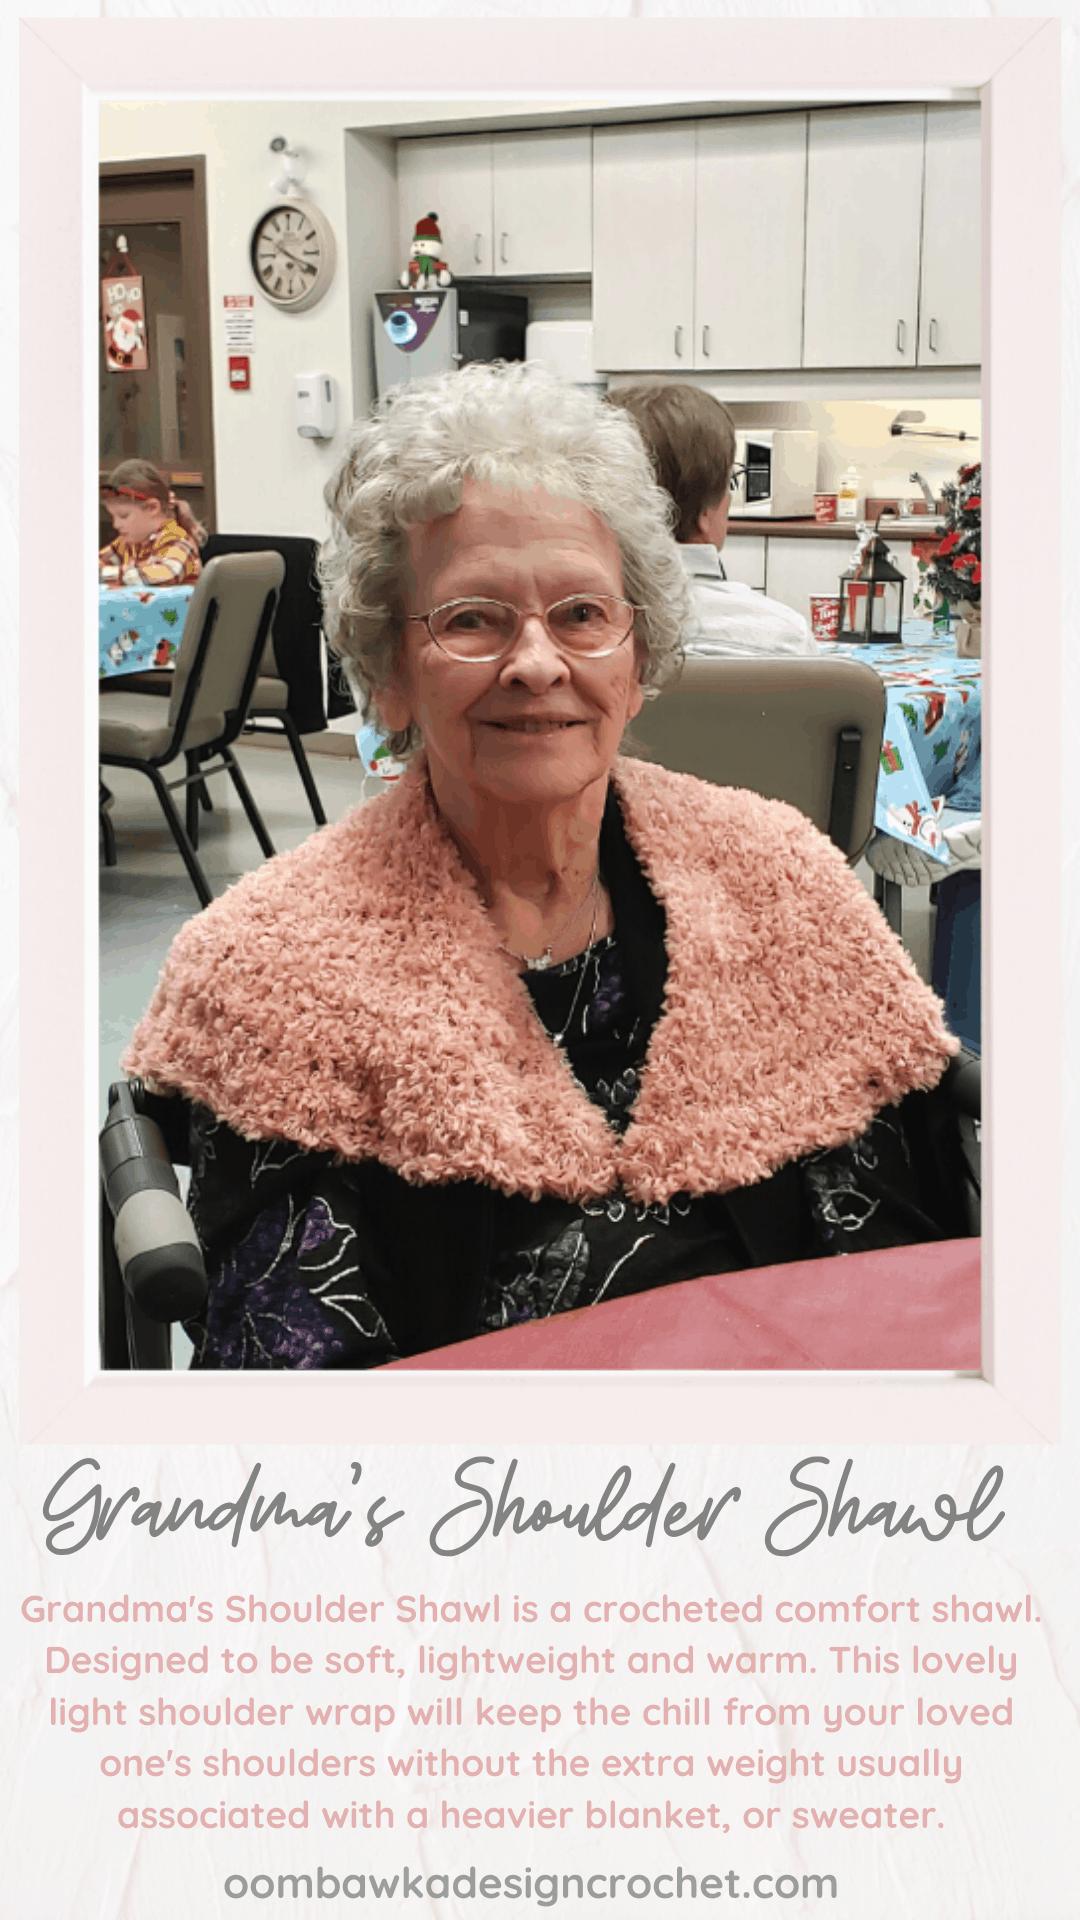 Grandma\'s Shoulder Shawl. Soft, lightweight and warm. Free Crochet Pattern. #redheartyarn #joycreators #yarnspirations #freepattern #shawl #wrap #crochet #comfortshawl